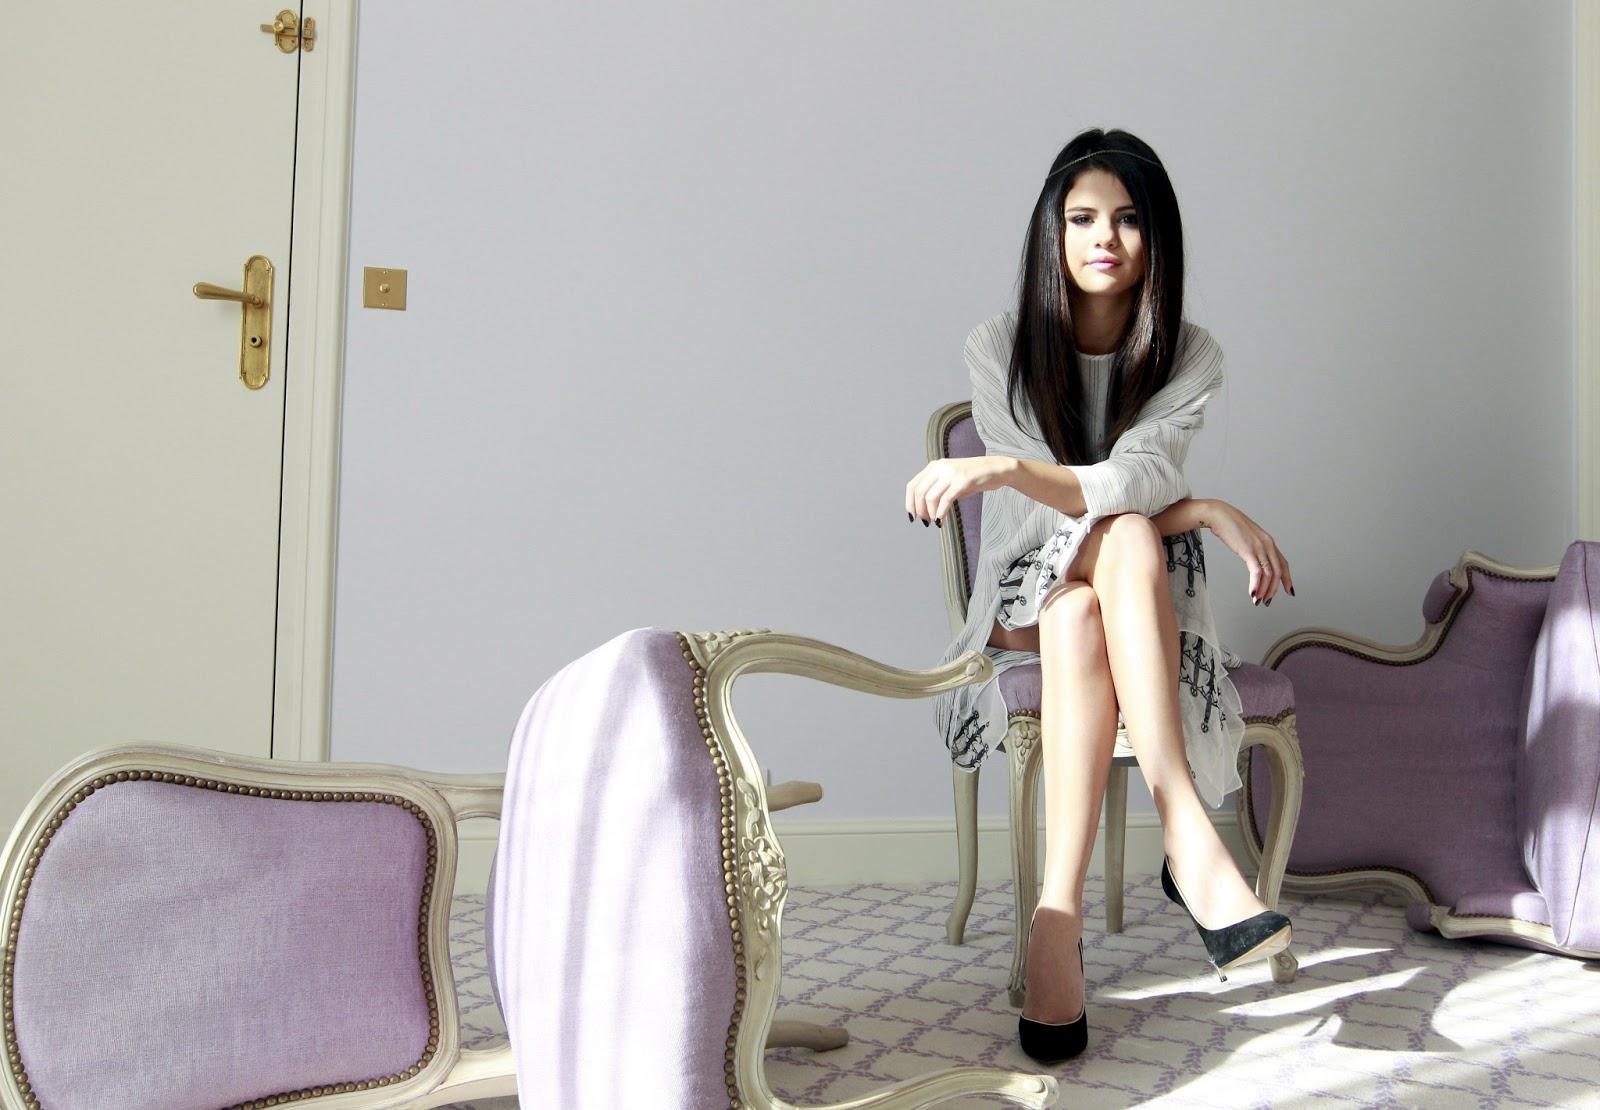 Selena Gomez – Paris Match photoshoot 2013 | Celebrities Photos Hub